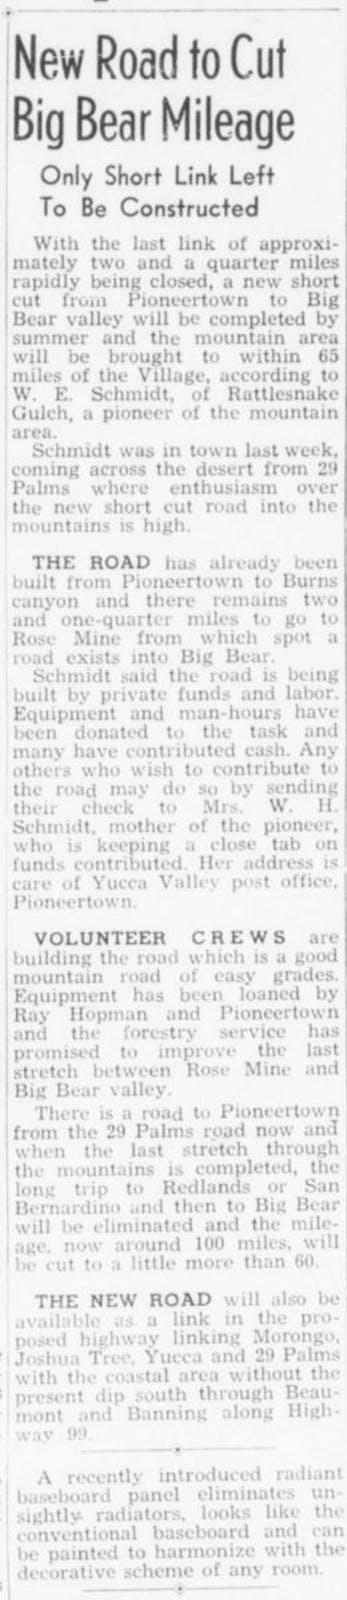 Mar. 26, 1948 - The Desert Sun article clipping